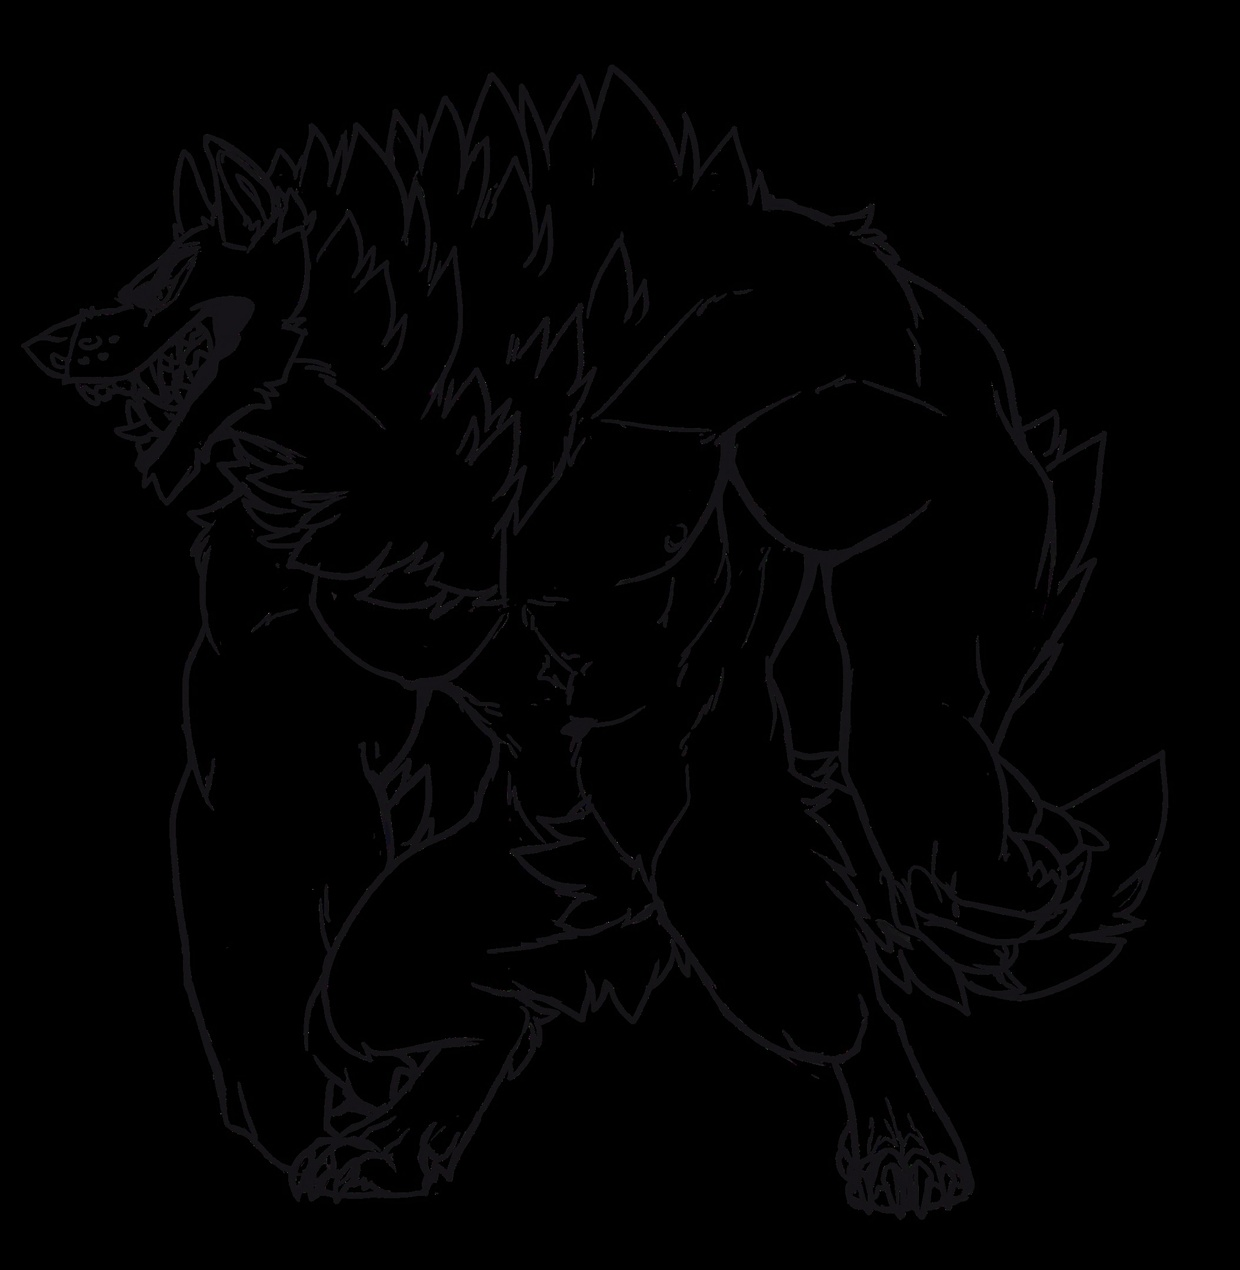 Werewolf lineart